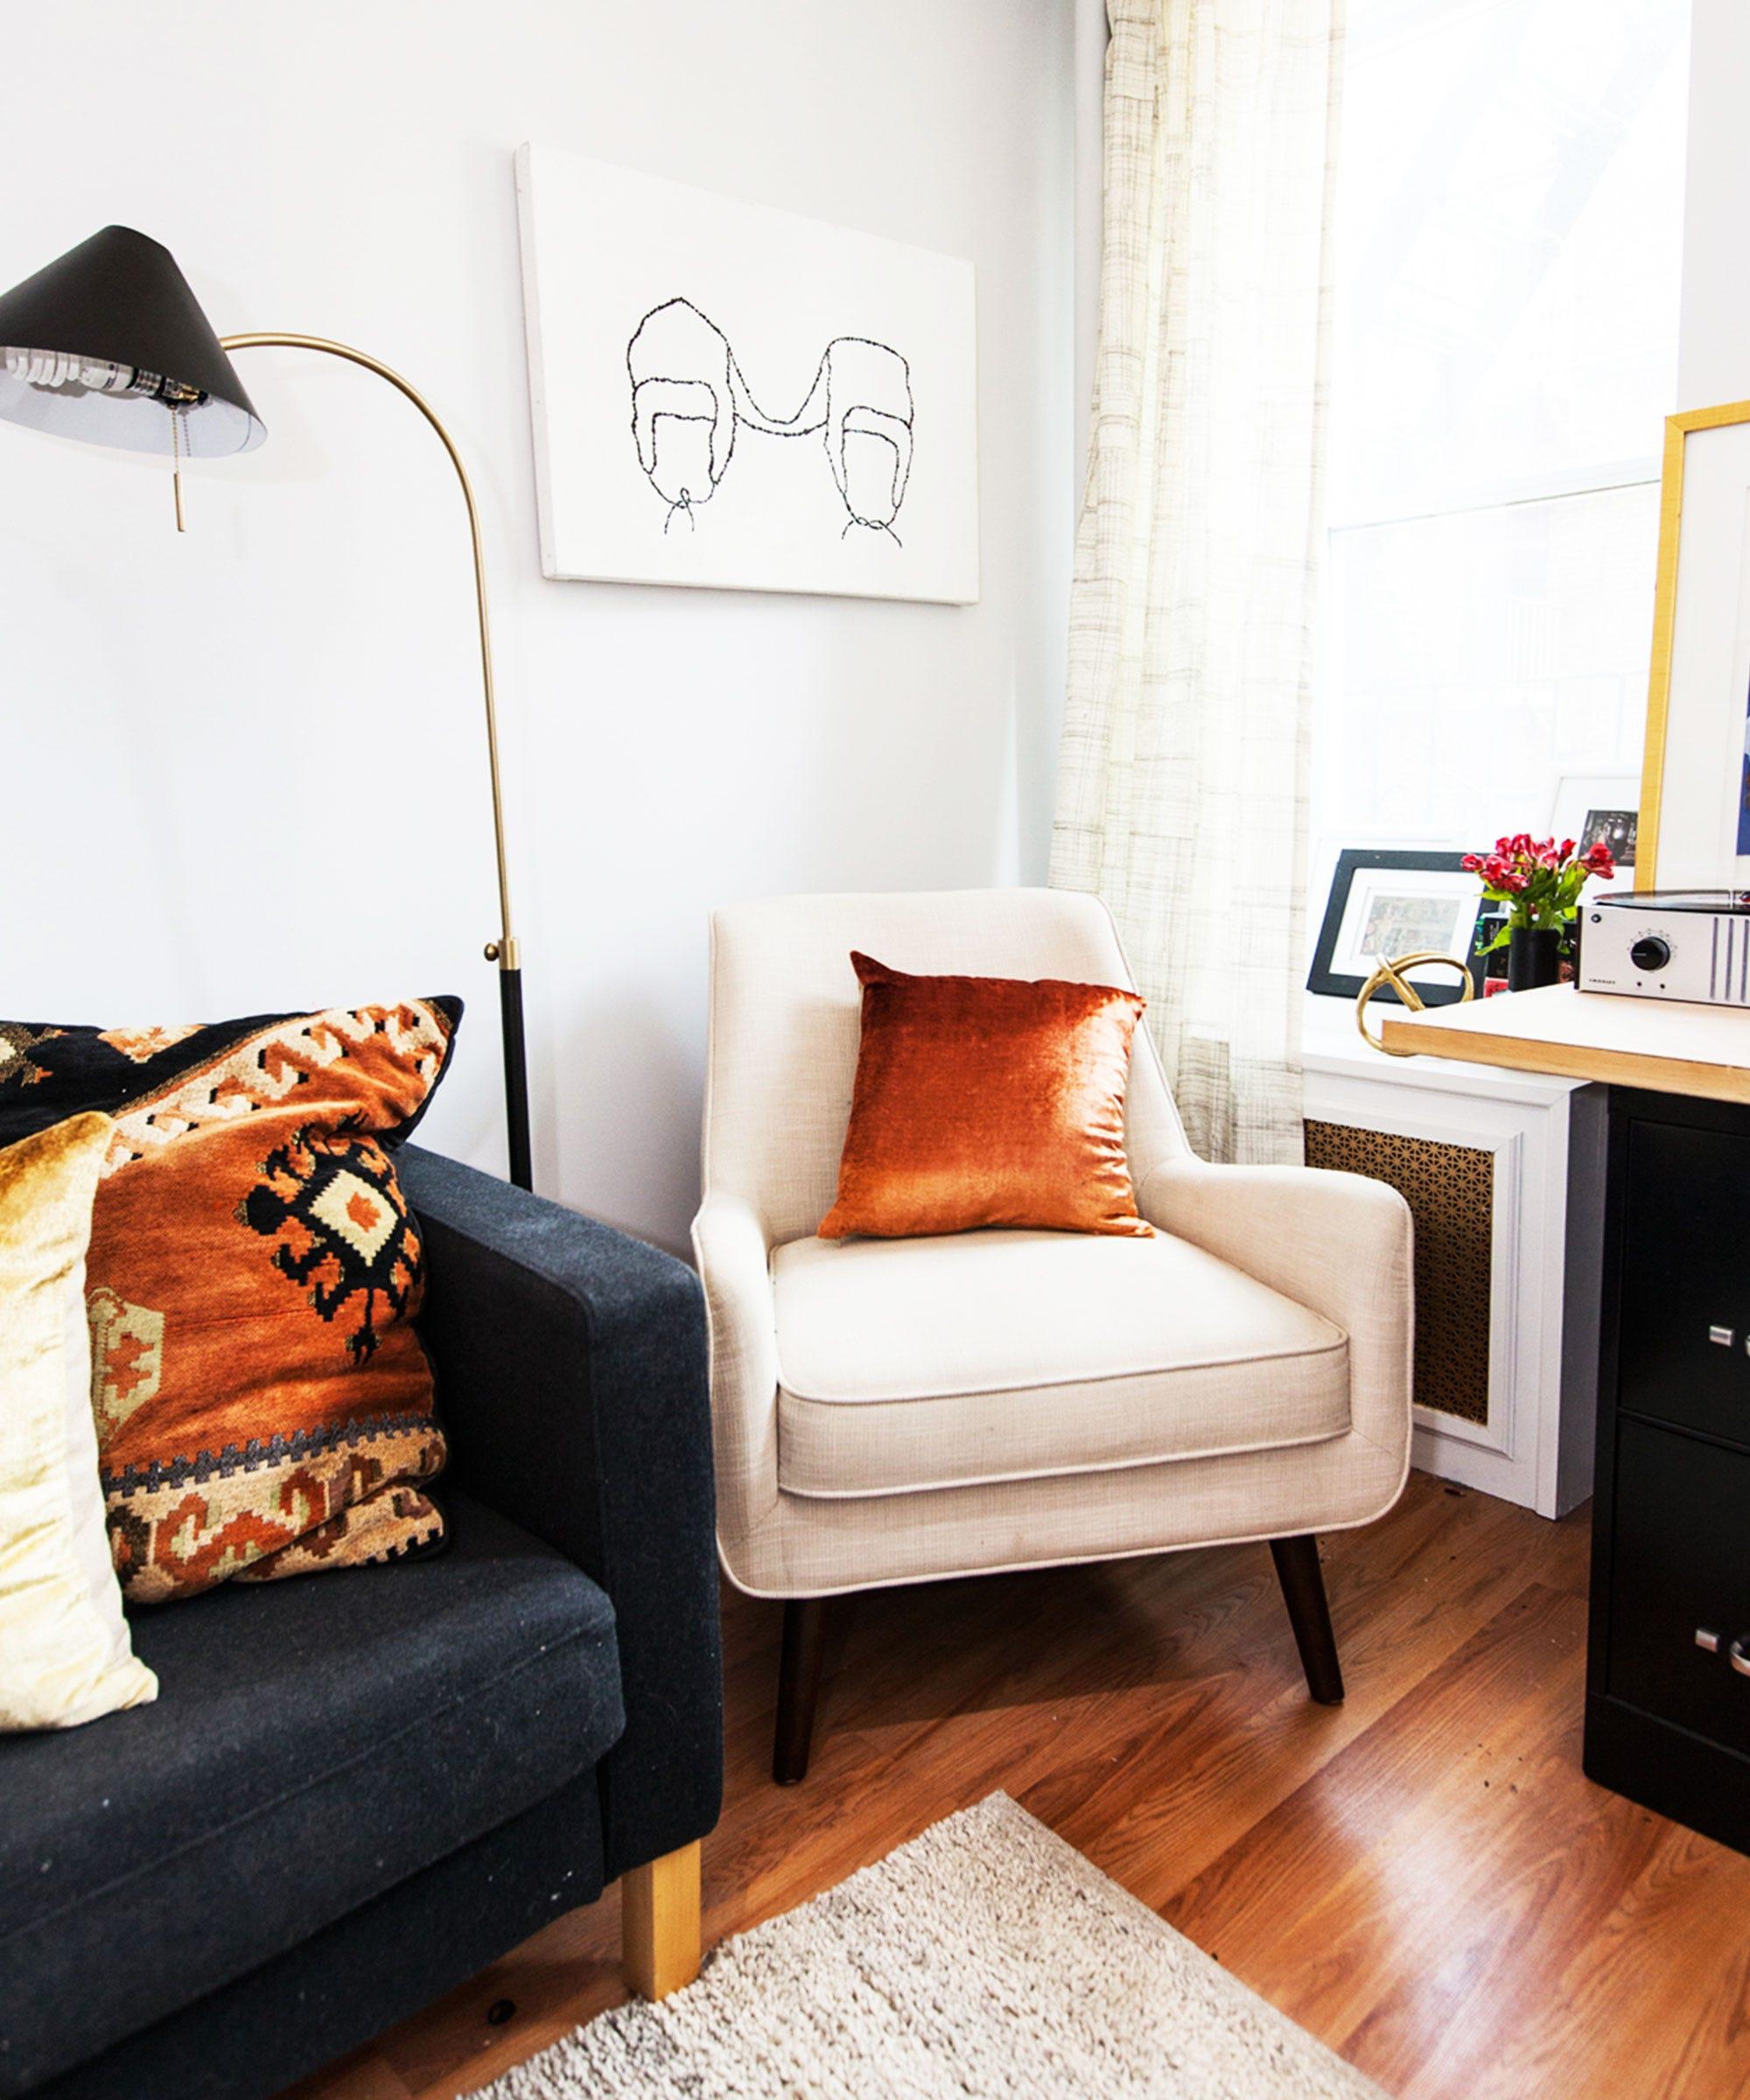 Confessions Of A Dorm Room Interior Designer